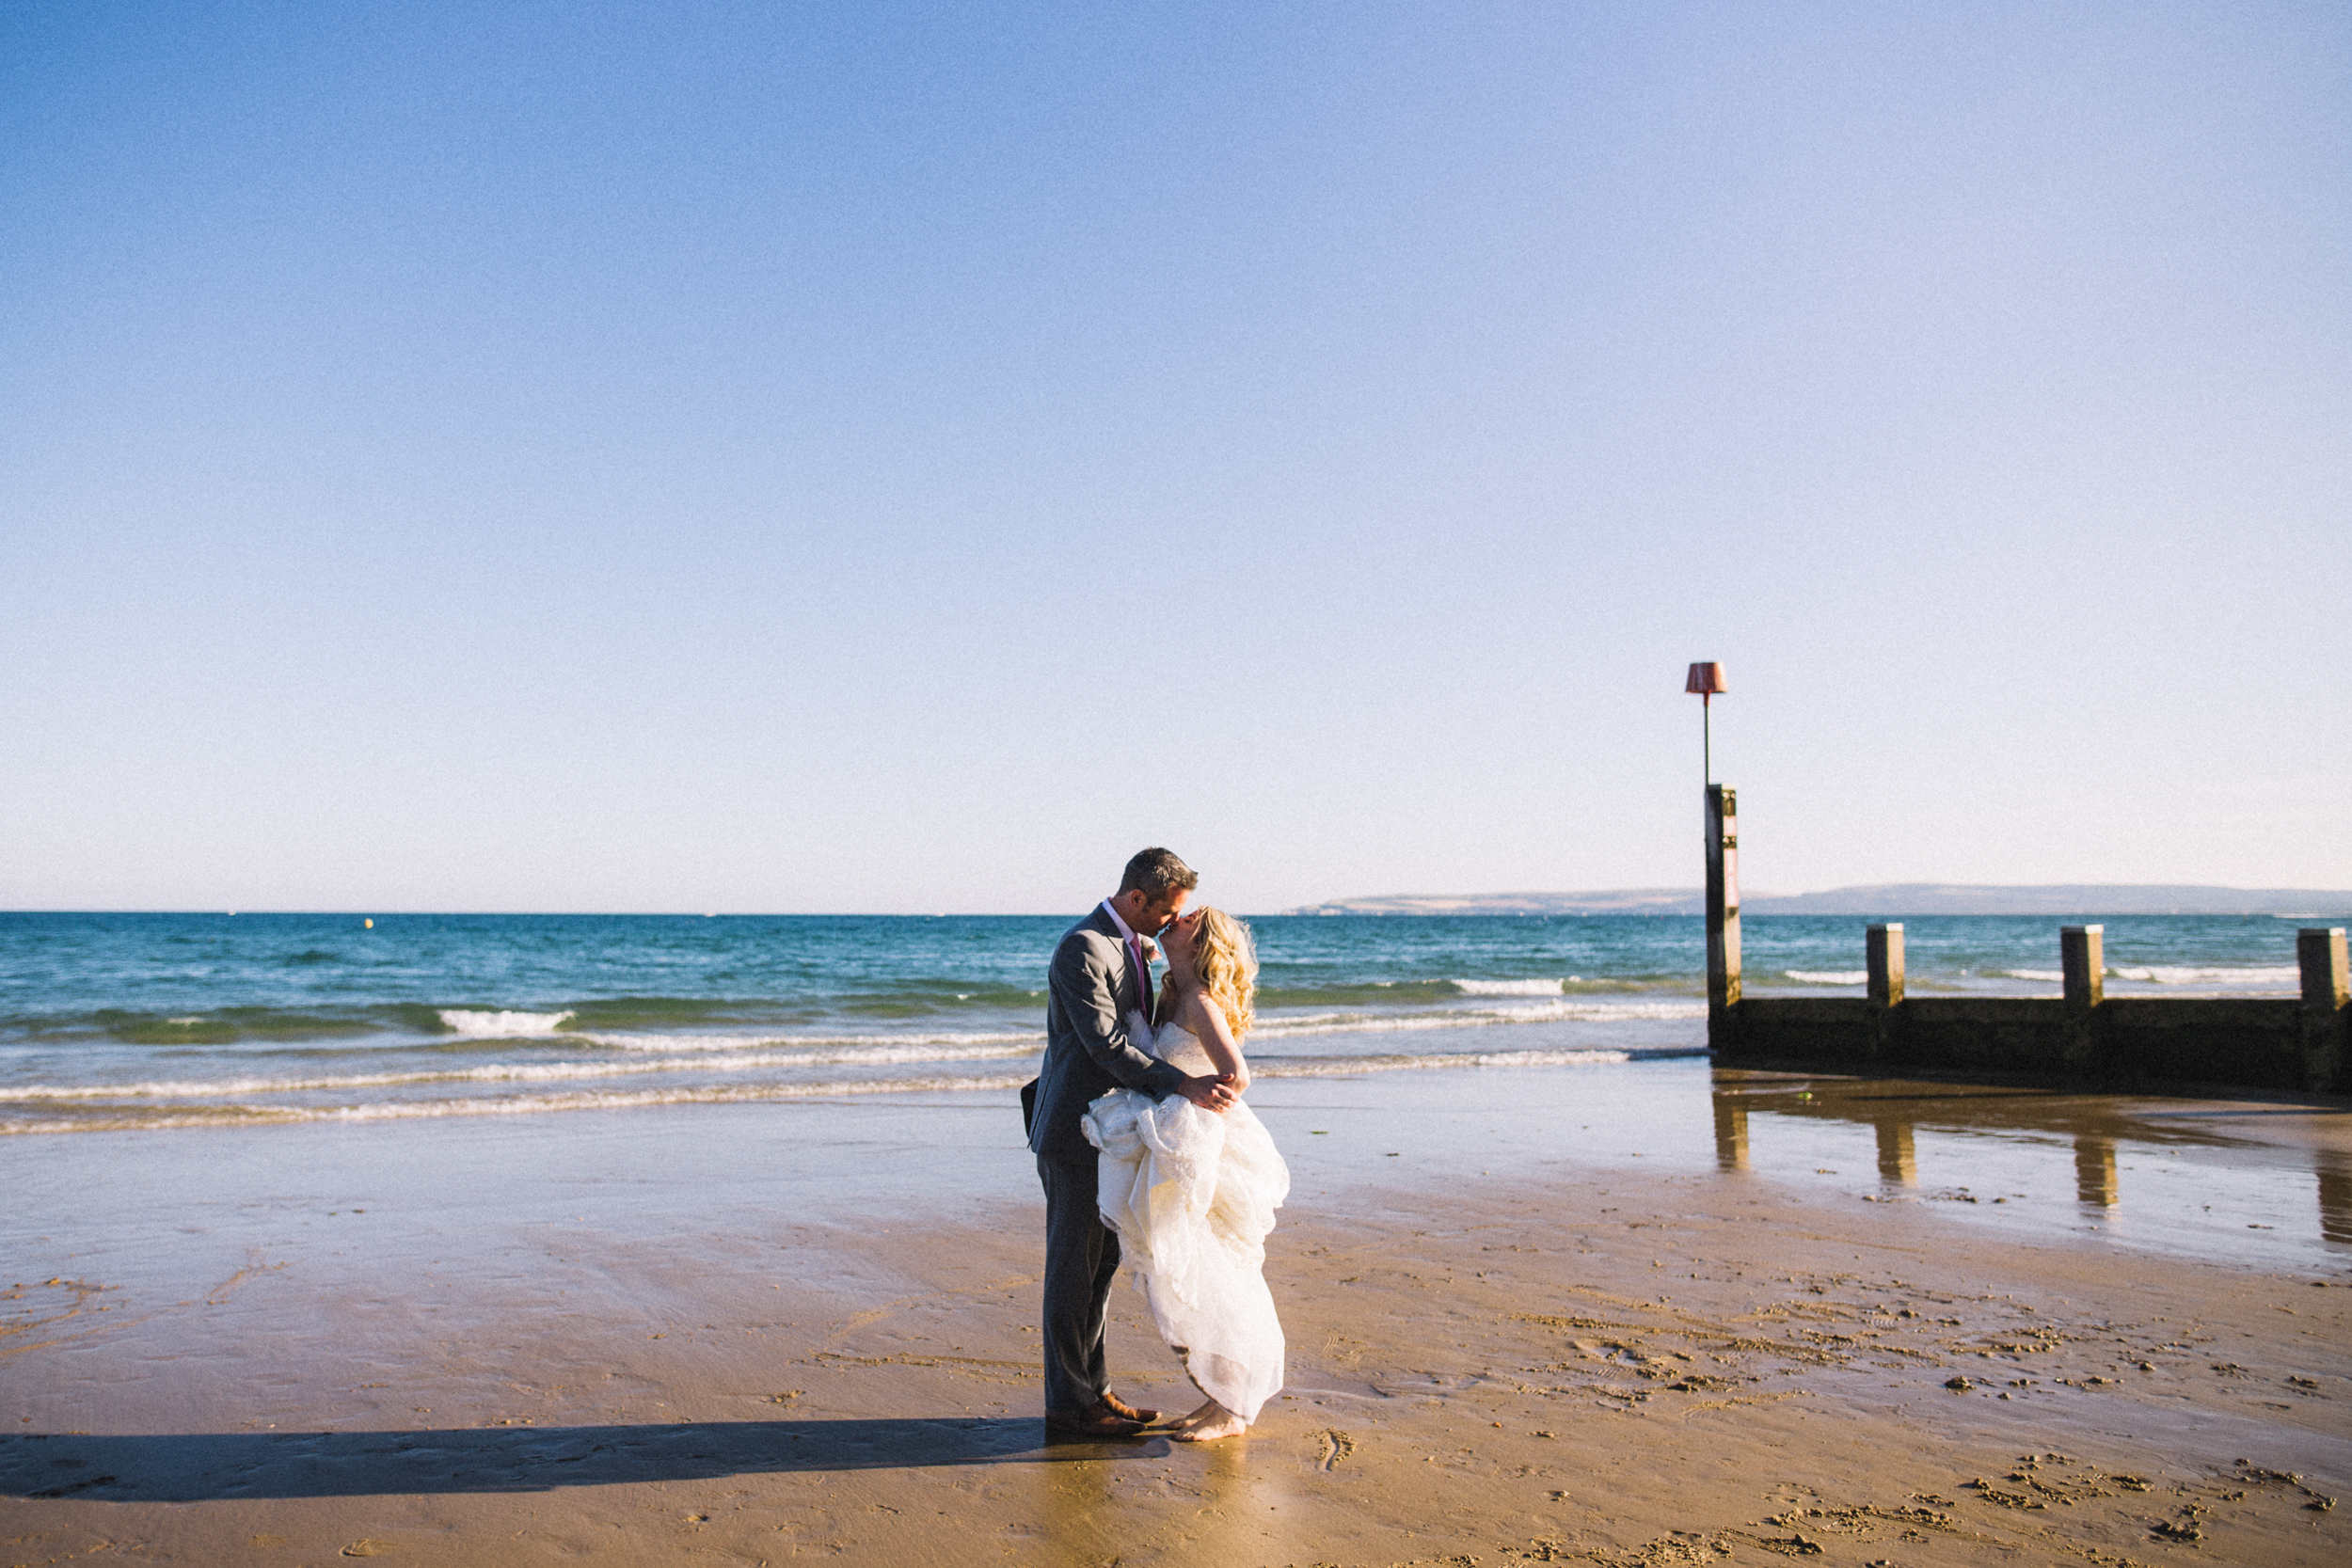 creative-wedding-photography-teesside-north-east-yorkshire-125.jpg